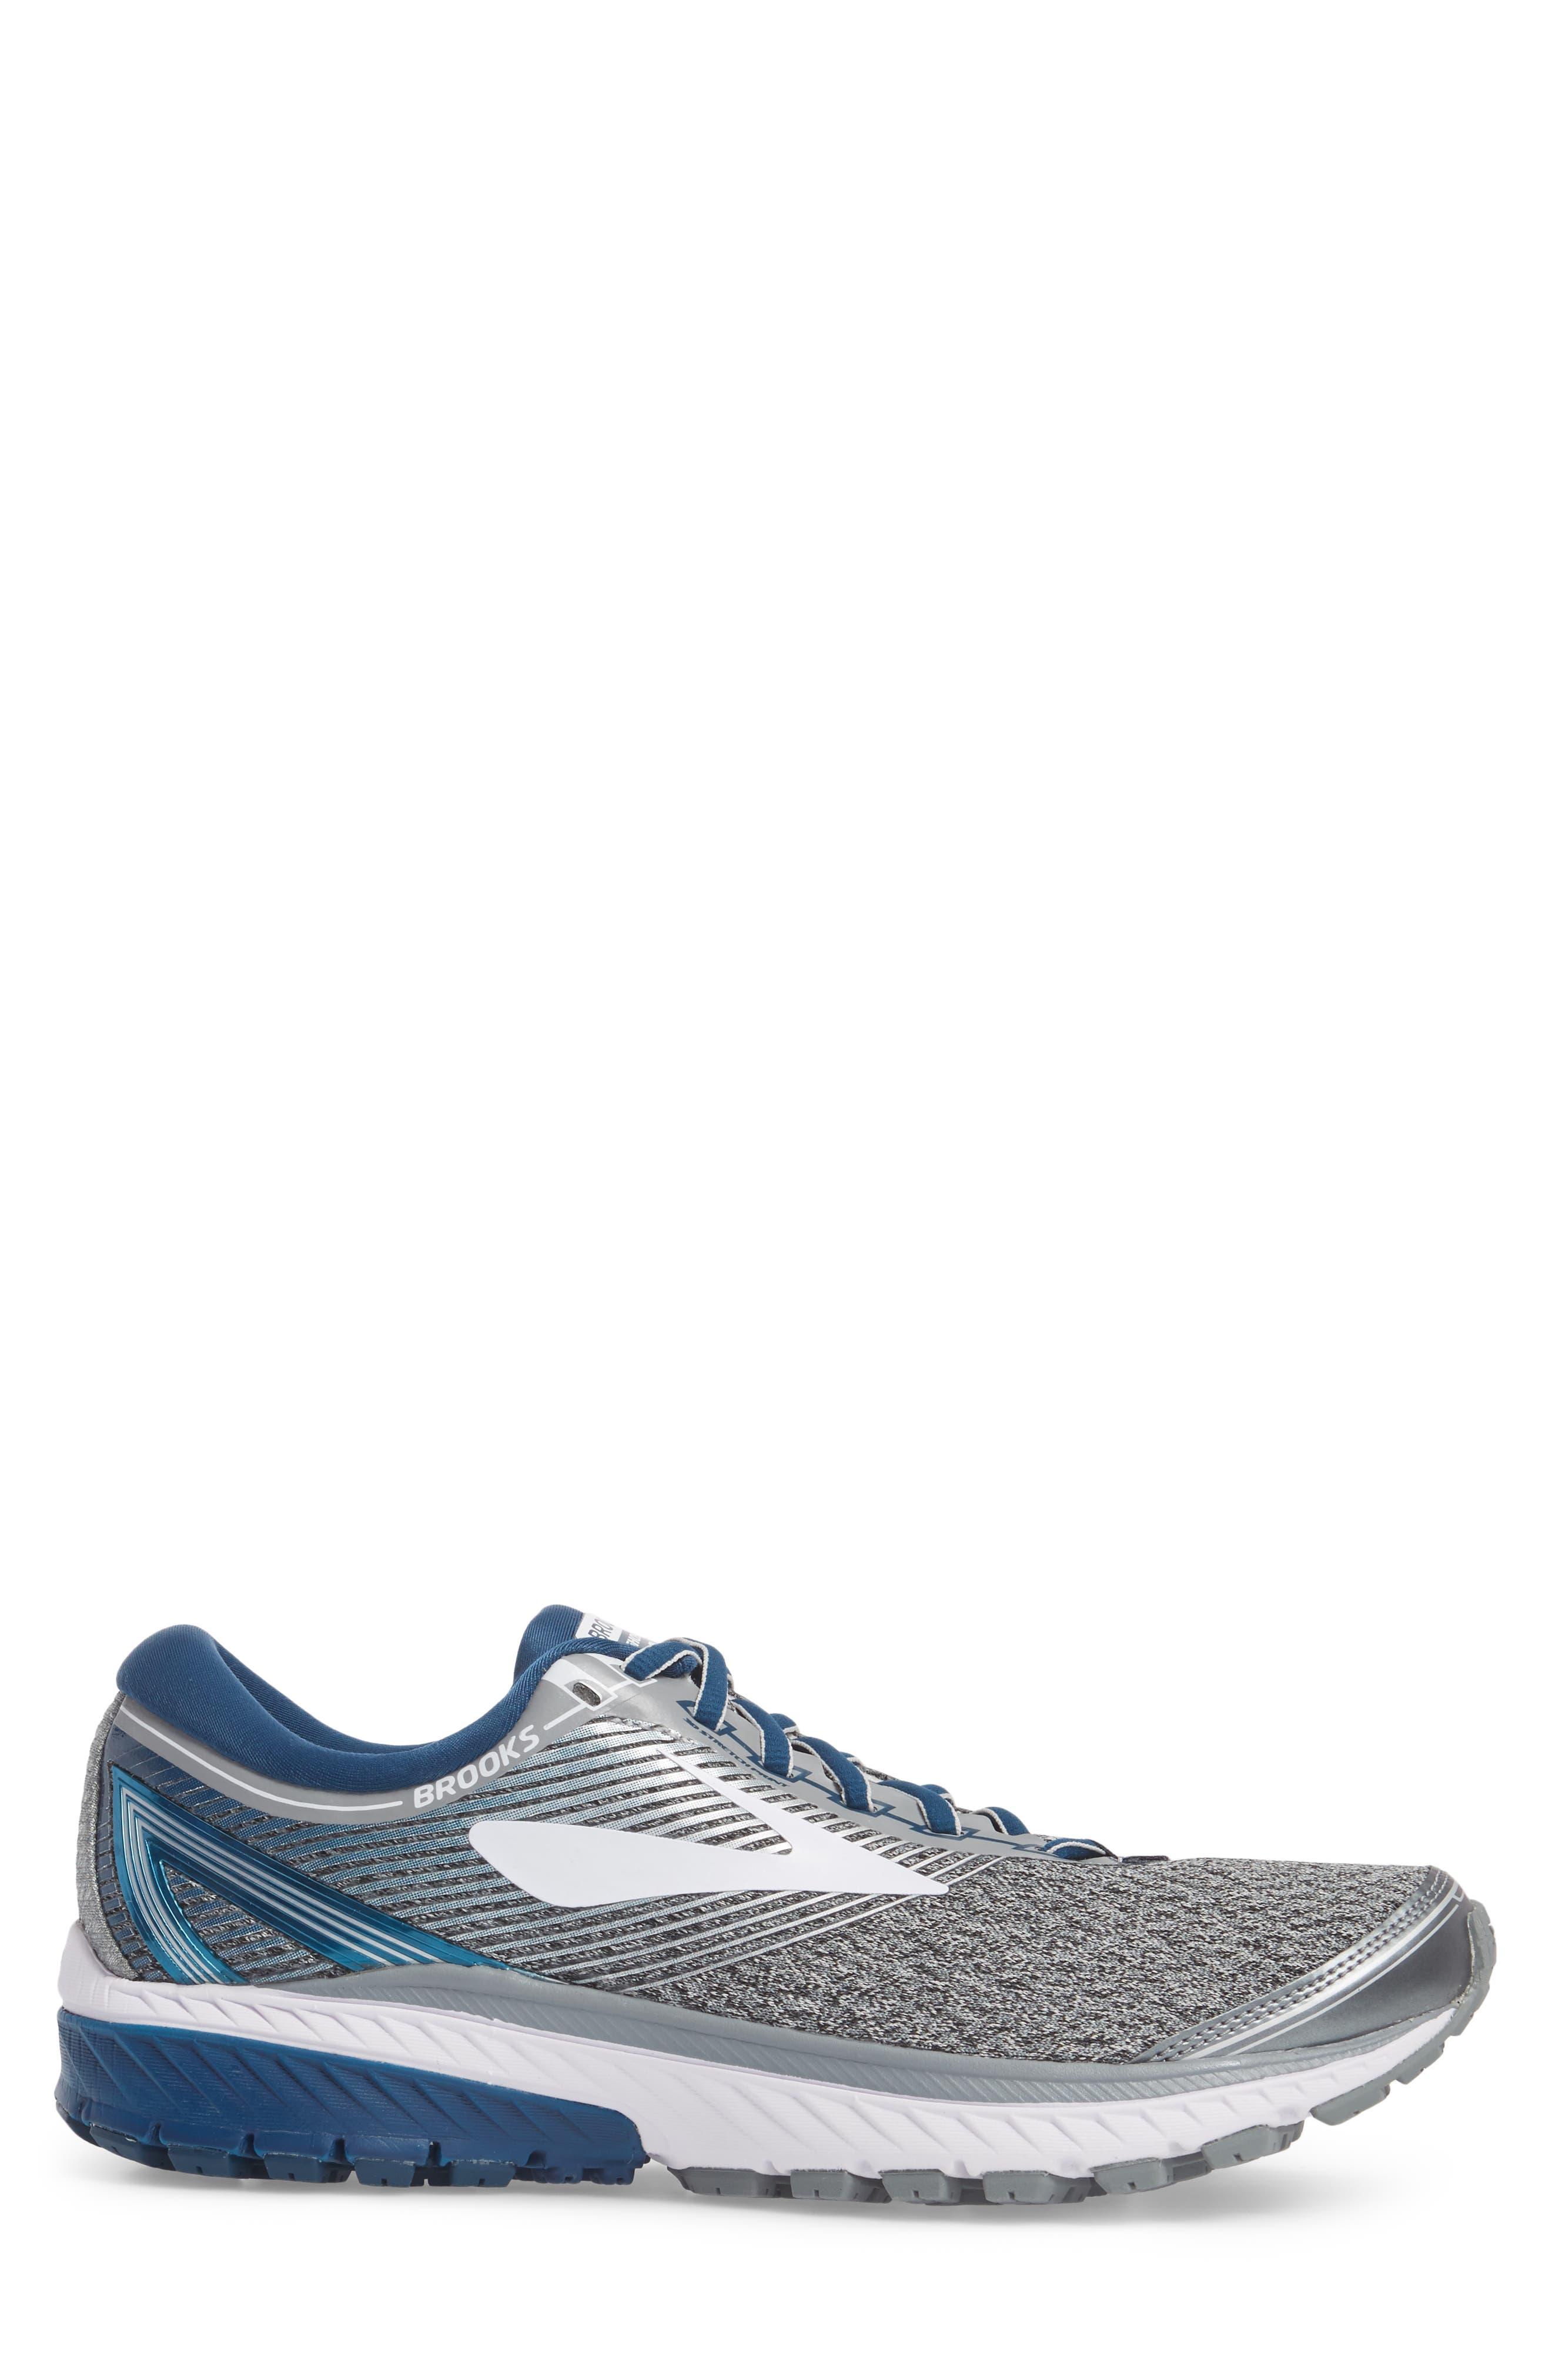 Ghost 10 Running Shoe,                             Alternate thumbnail 3, color,                             SILVER/ BLUE/ WHITE